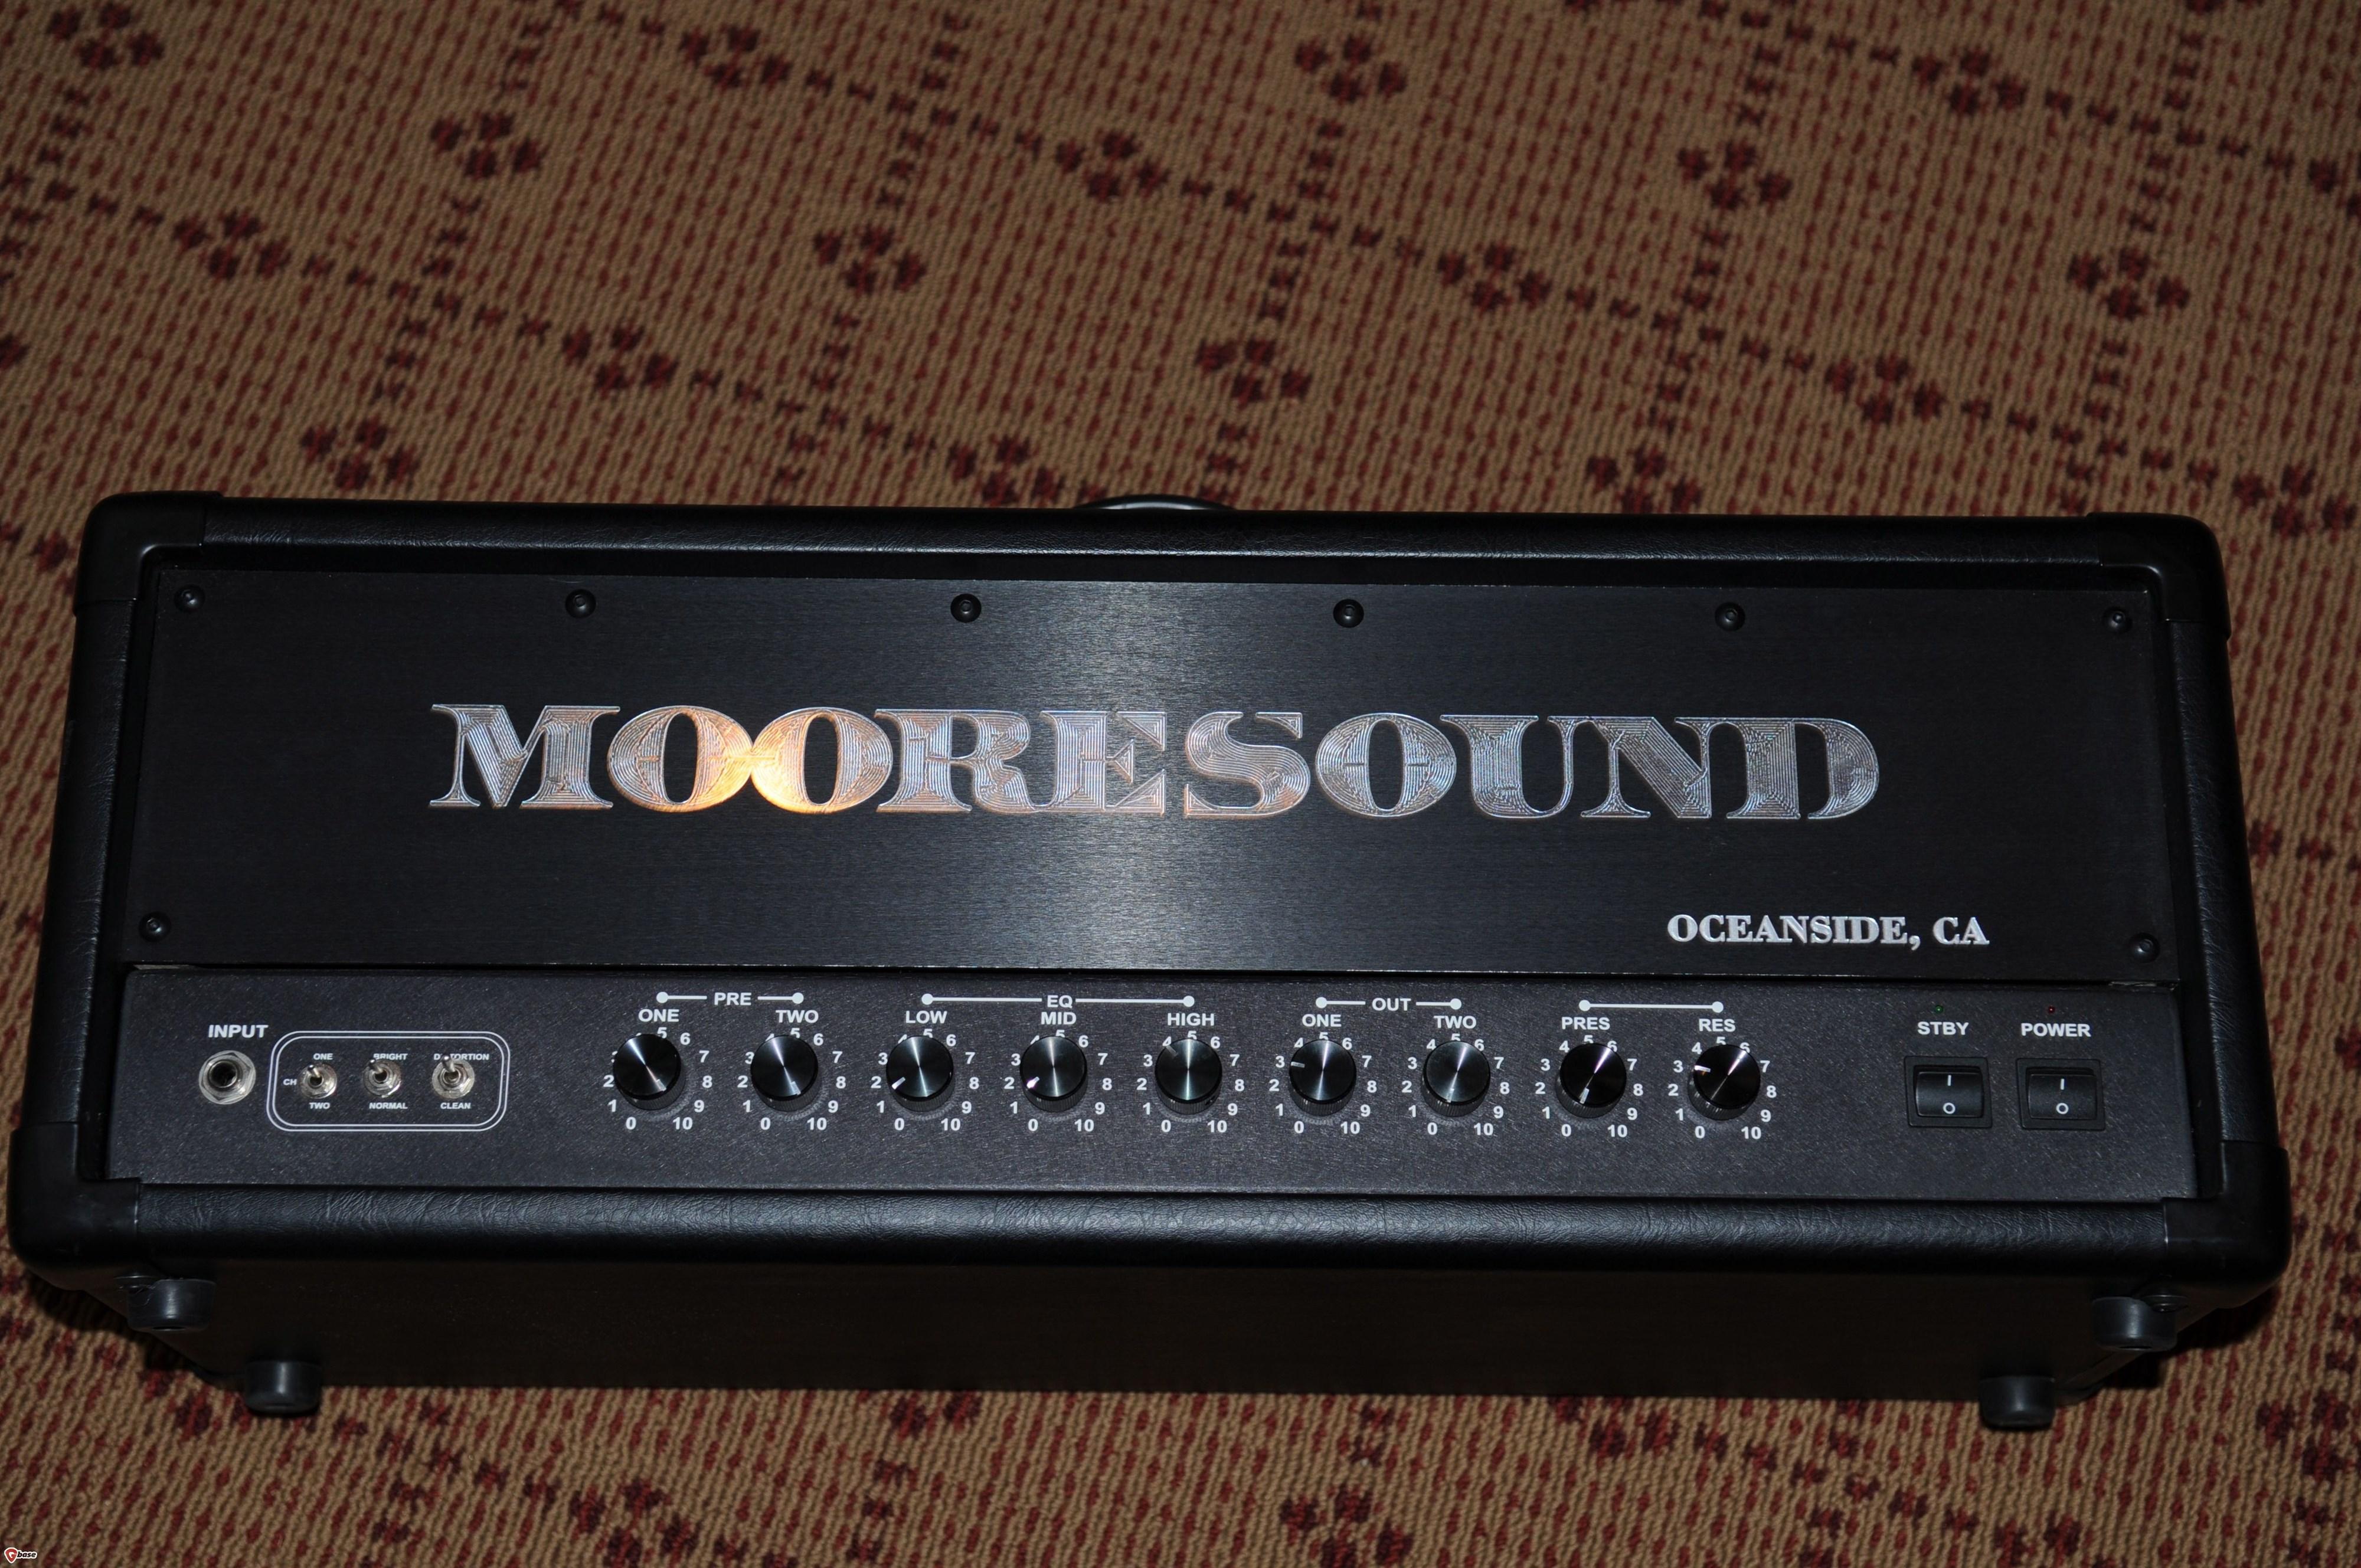 2012 Mooresound 50w Marshallesque HEAD